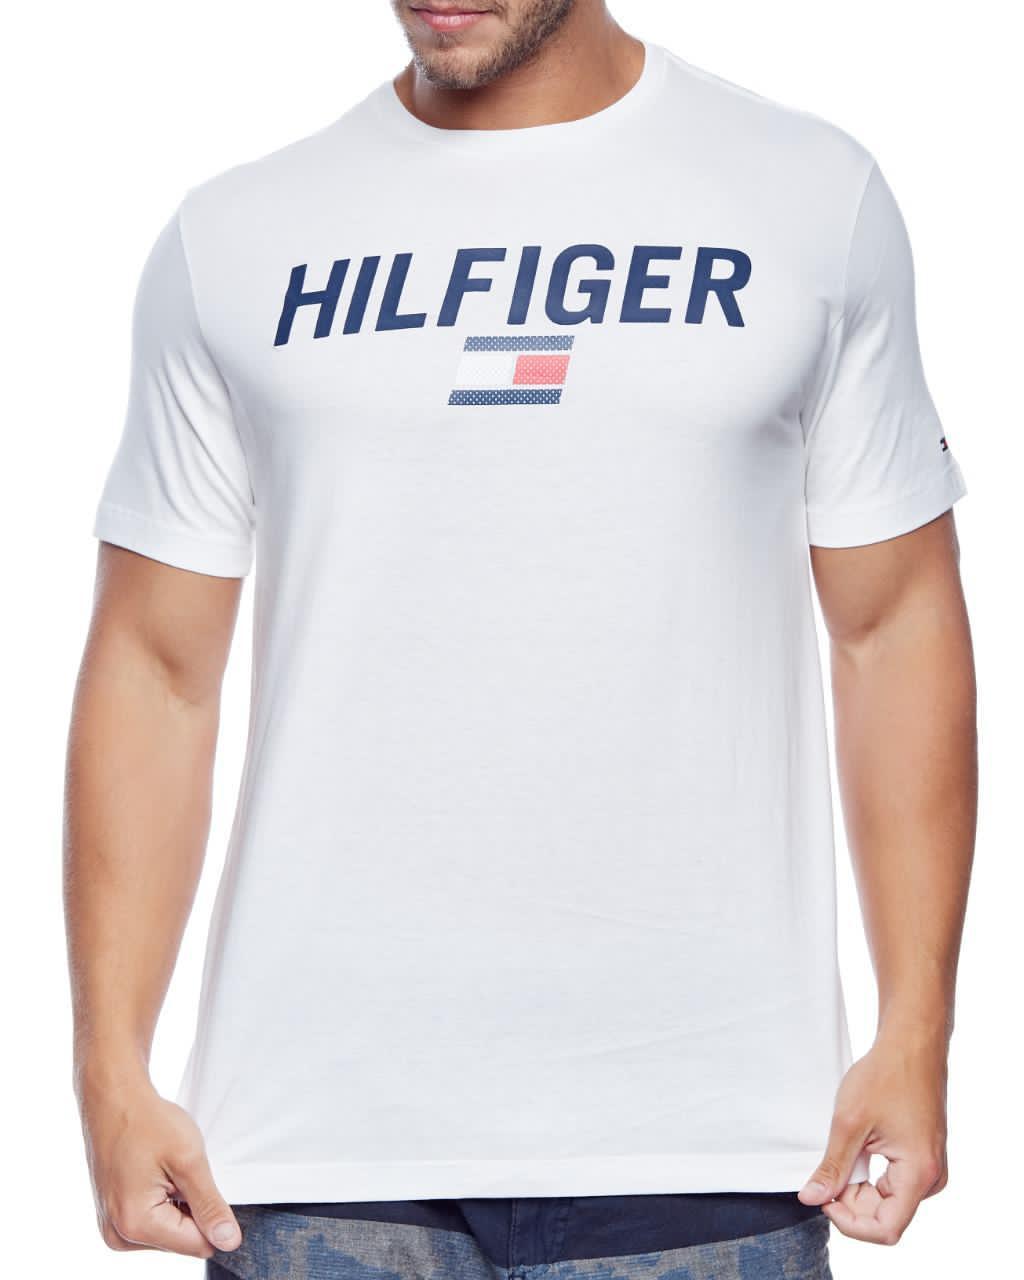 Camiseta Tommy Hilfiger Masculina Custom Fit Coupe Lettering Flag Branco